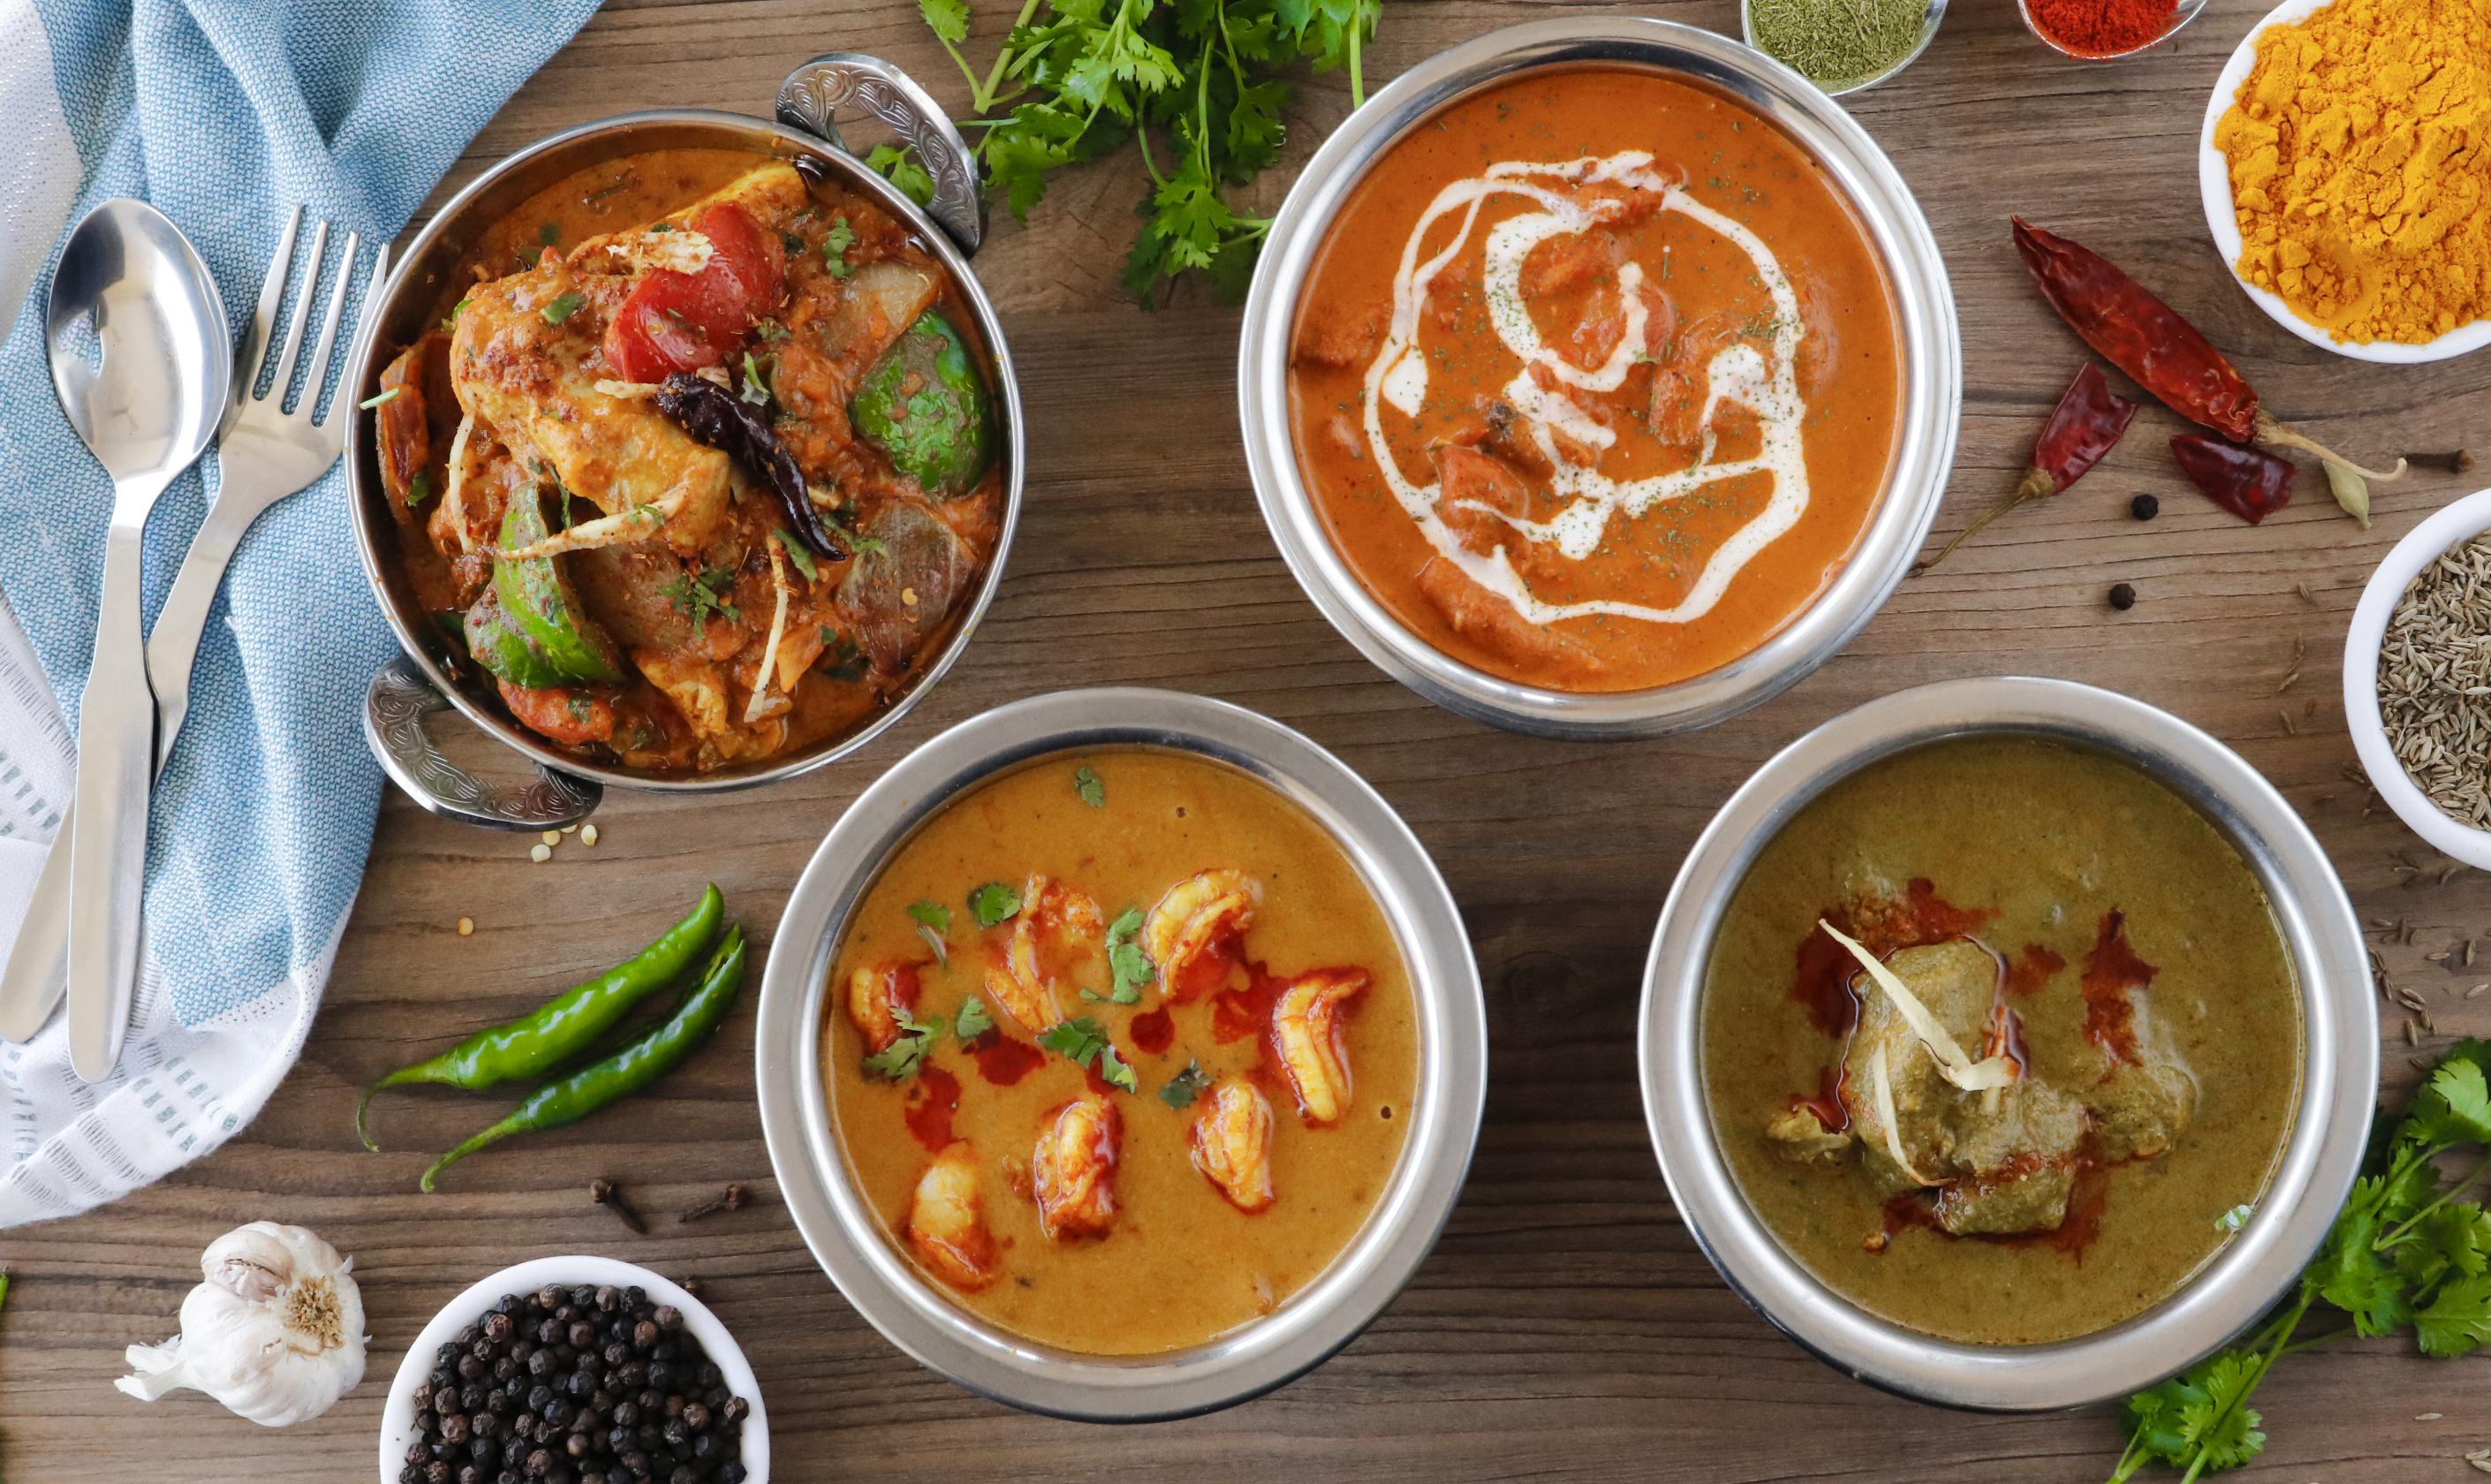 Sreenidhi Family Restaurant